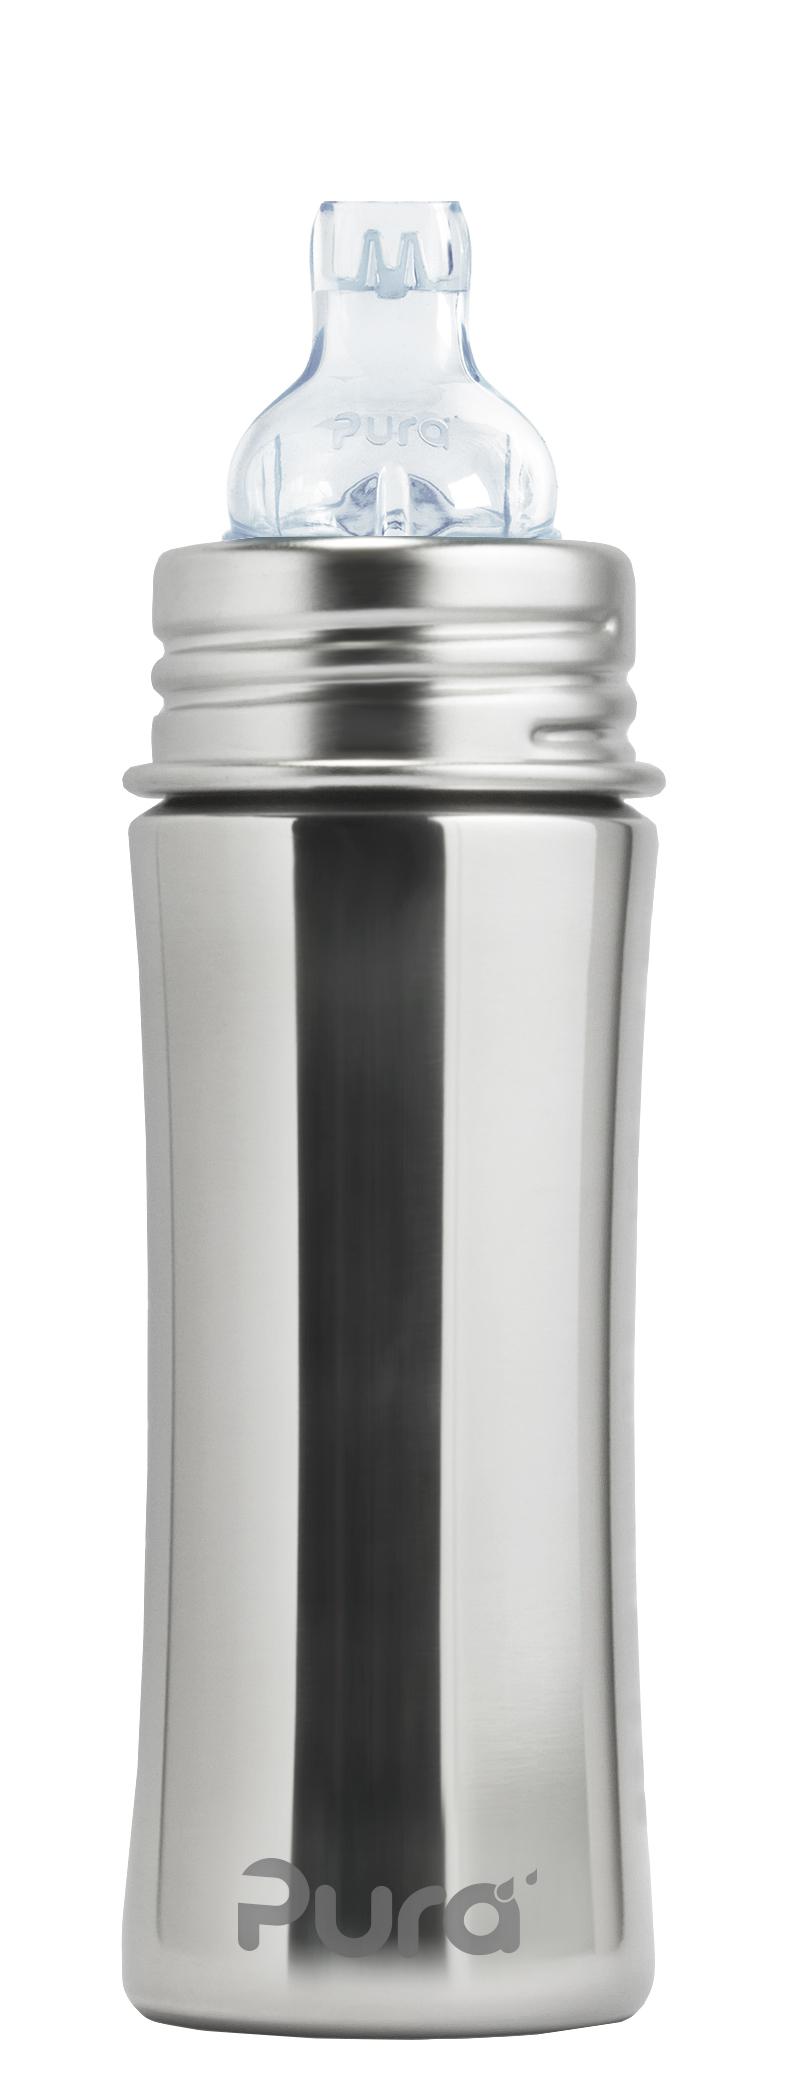 300 ml Edelstahl Sleeve Hülle Pura Kiki Babyflasche mit Sauger plastikfrei